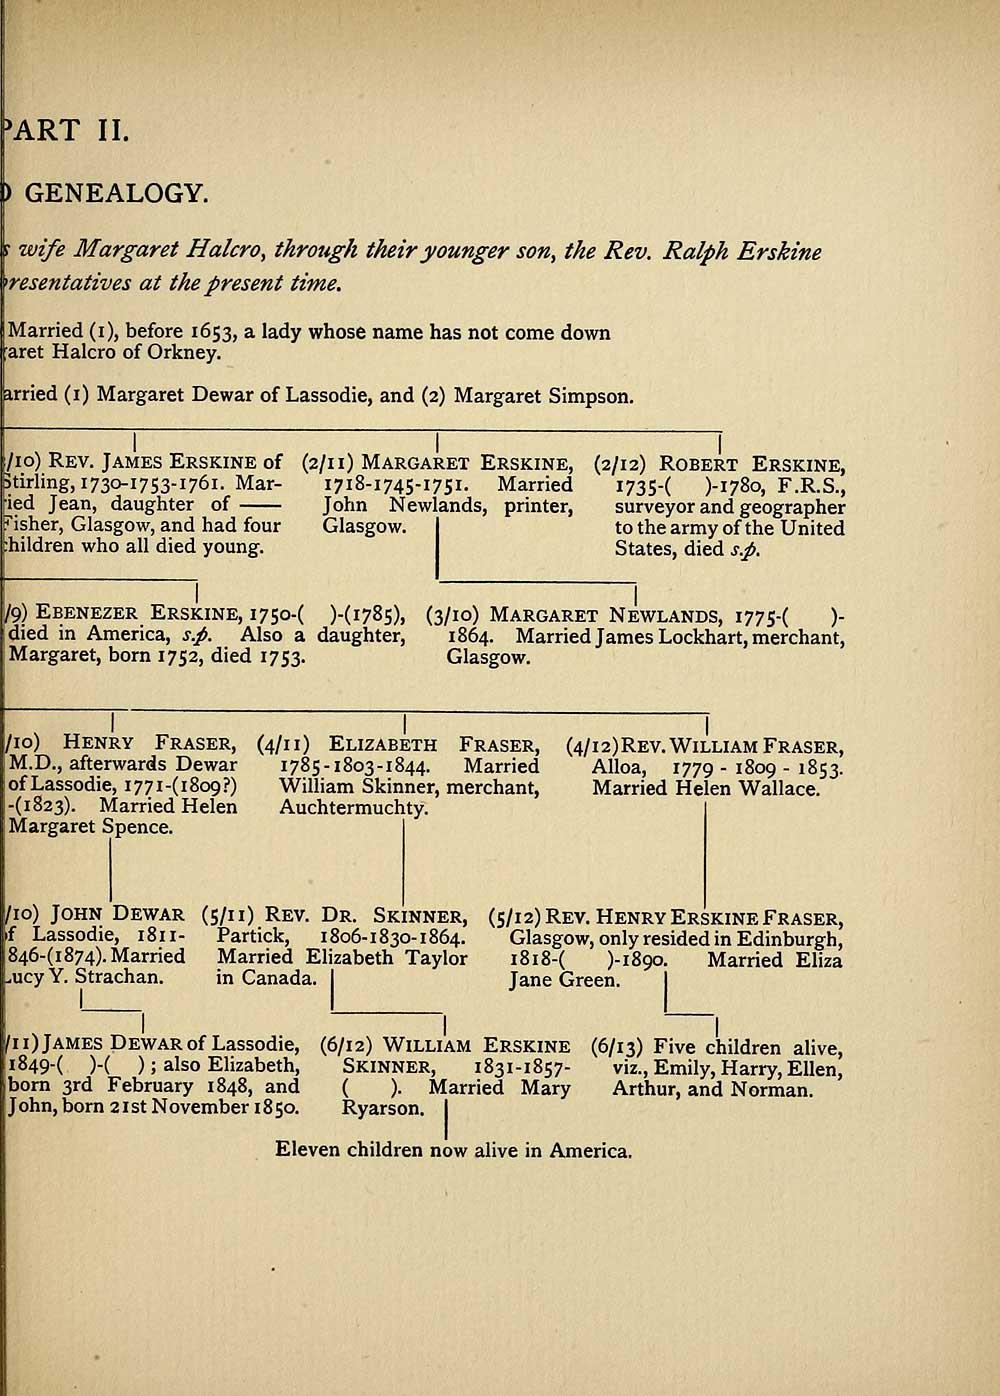 69) Genealogical chart - Erskine Halcro genealogy